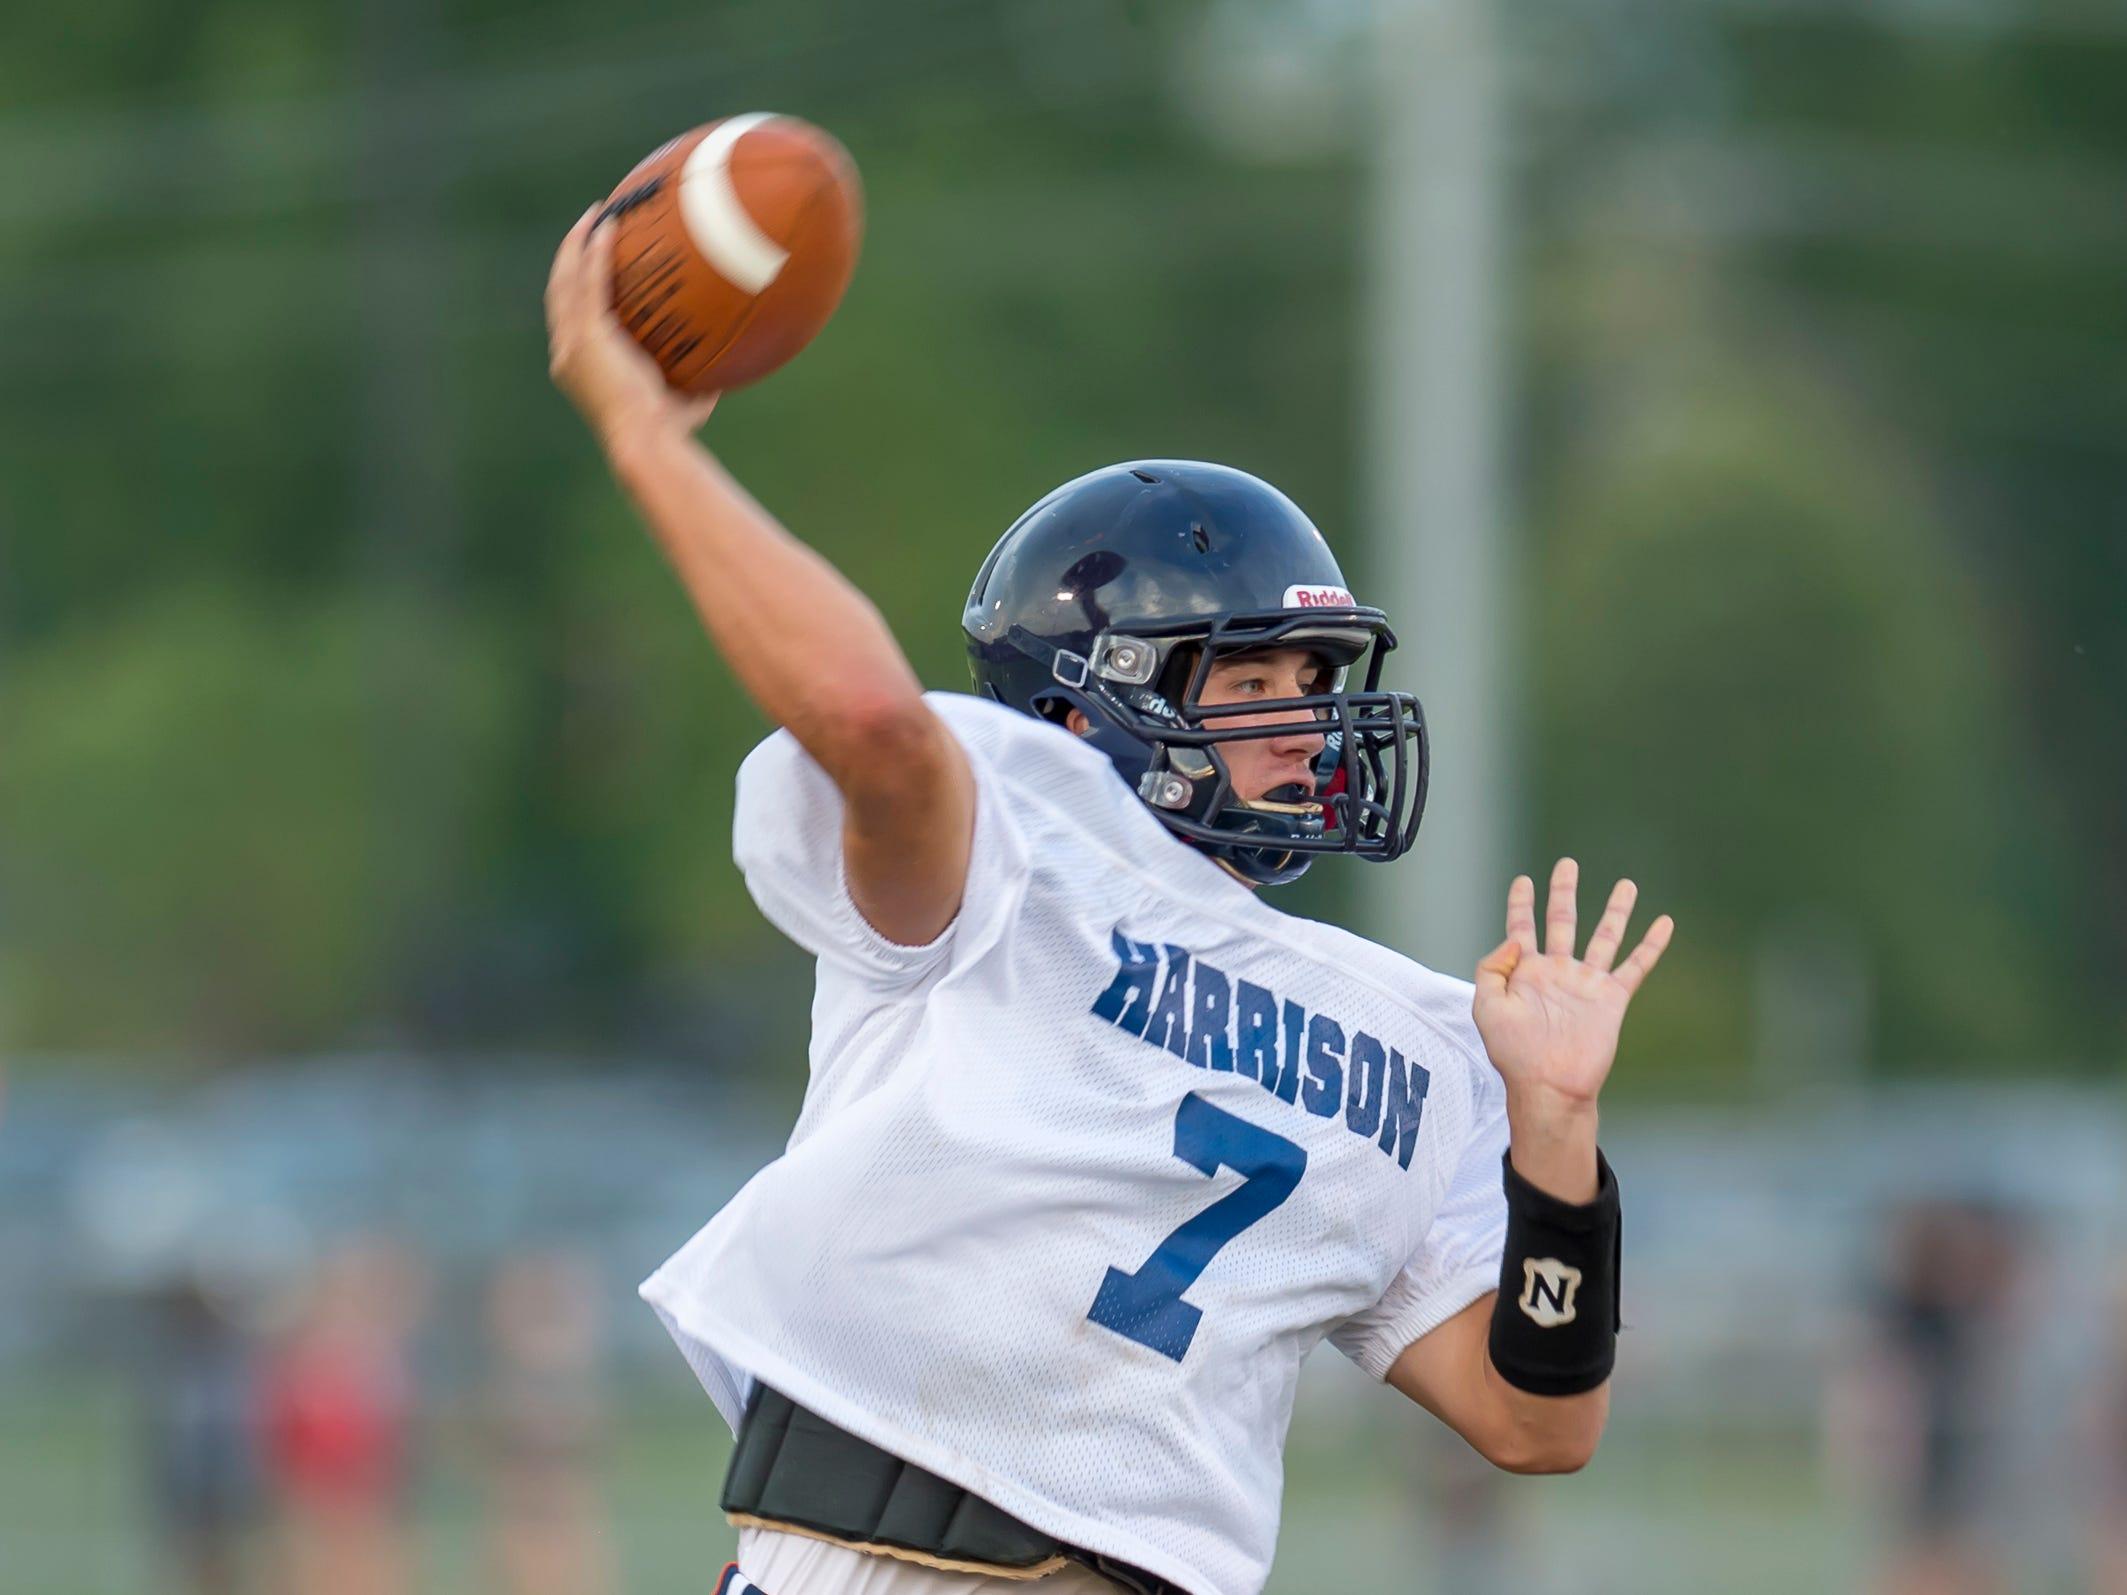 Harrison quarterback Andrew Jensen